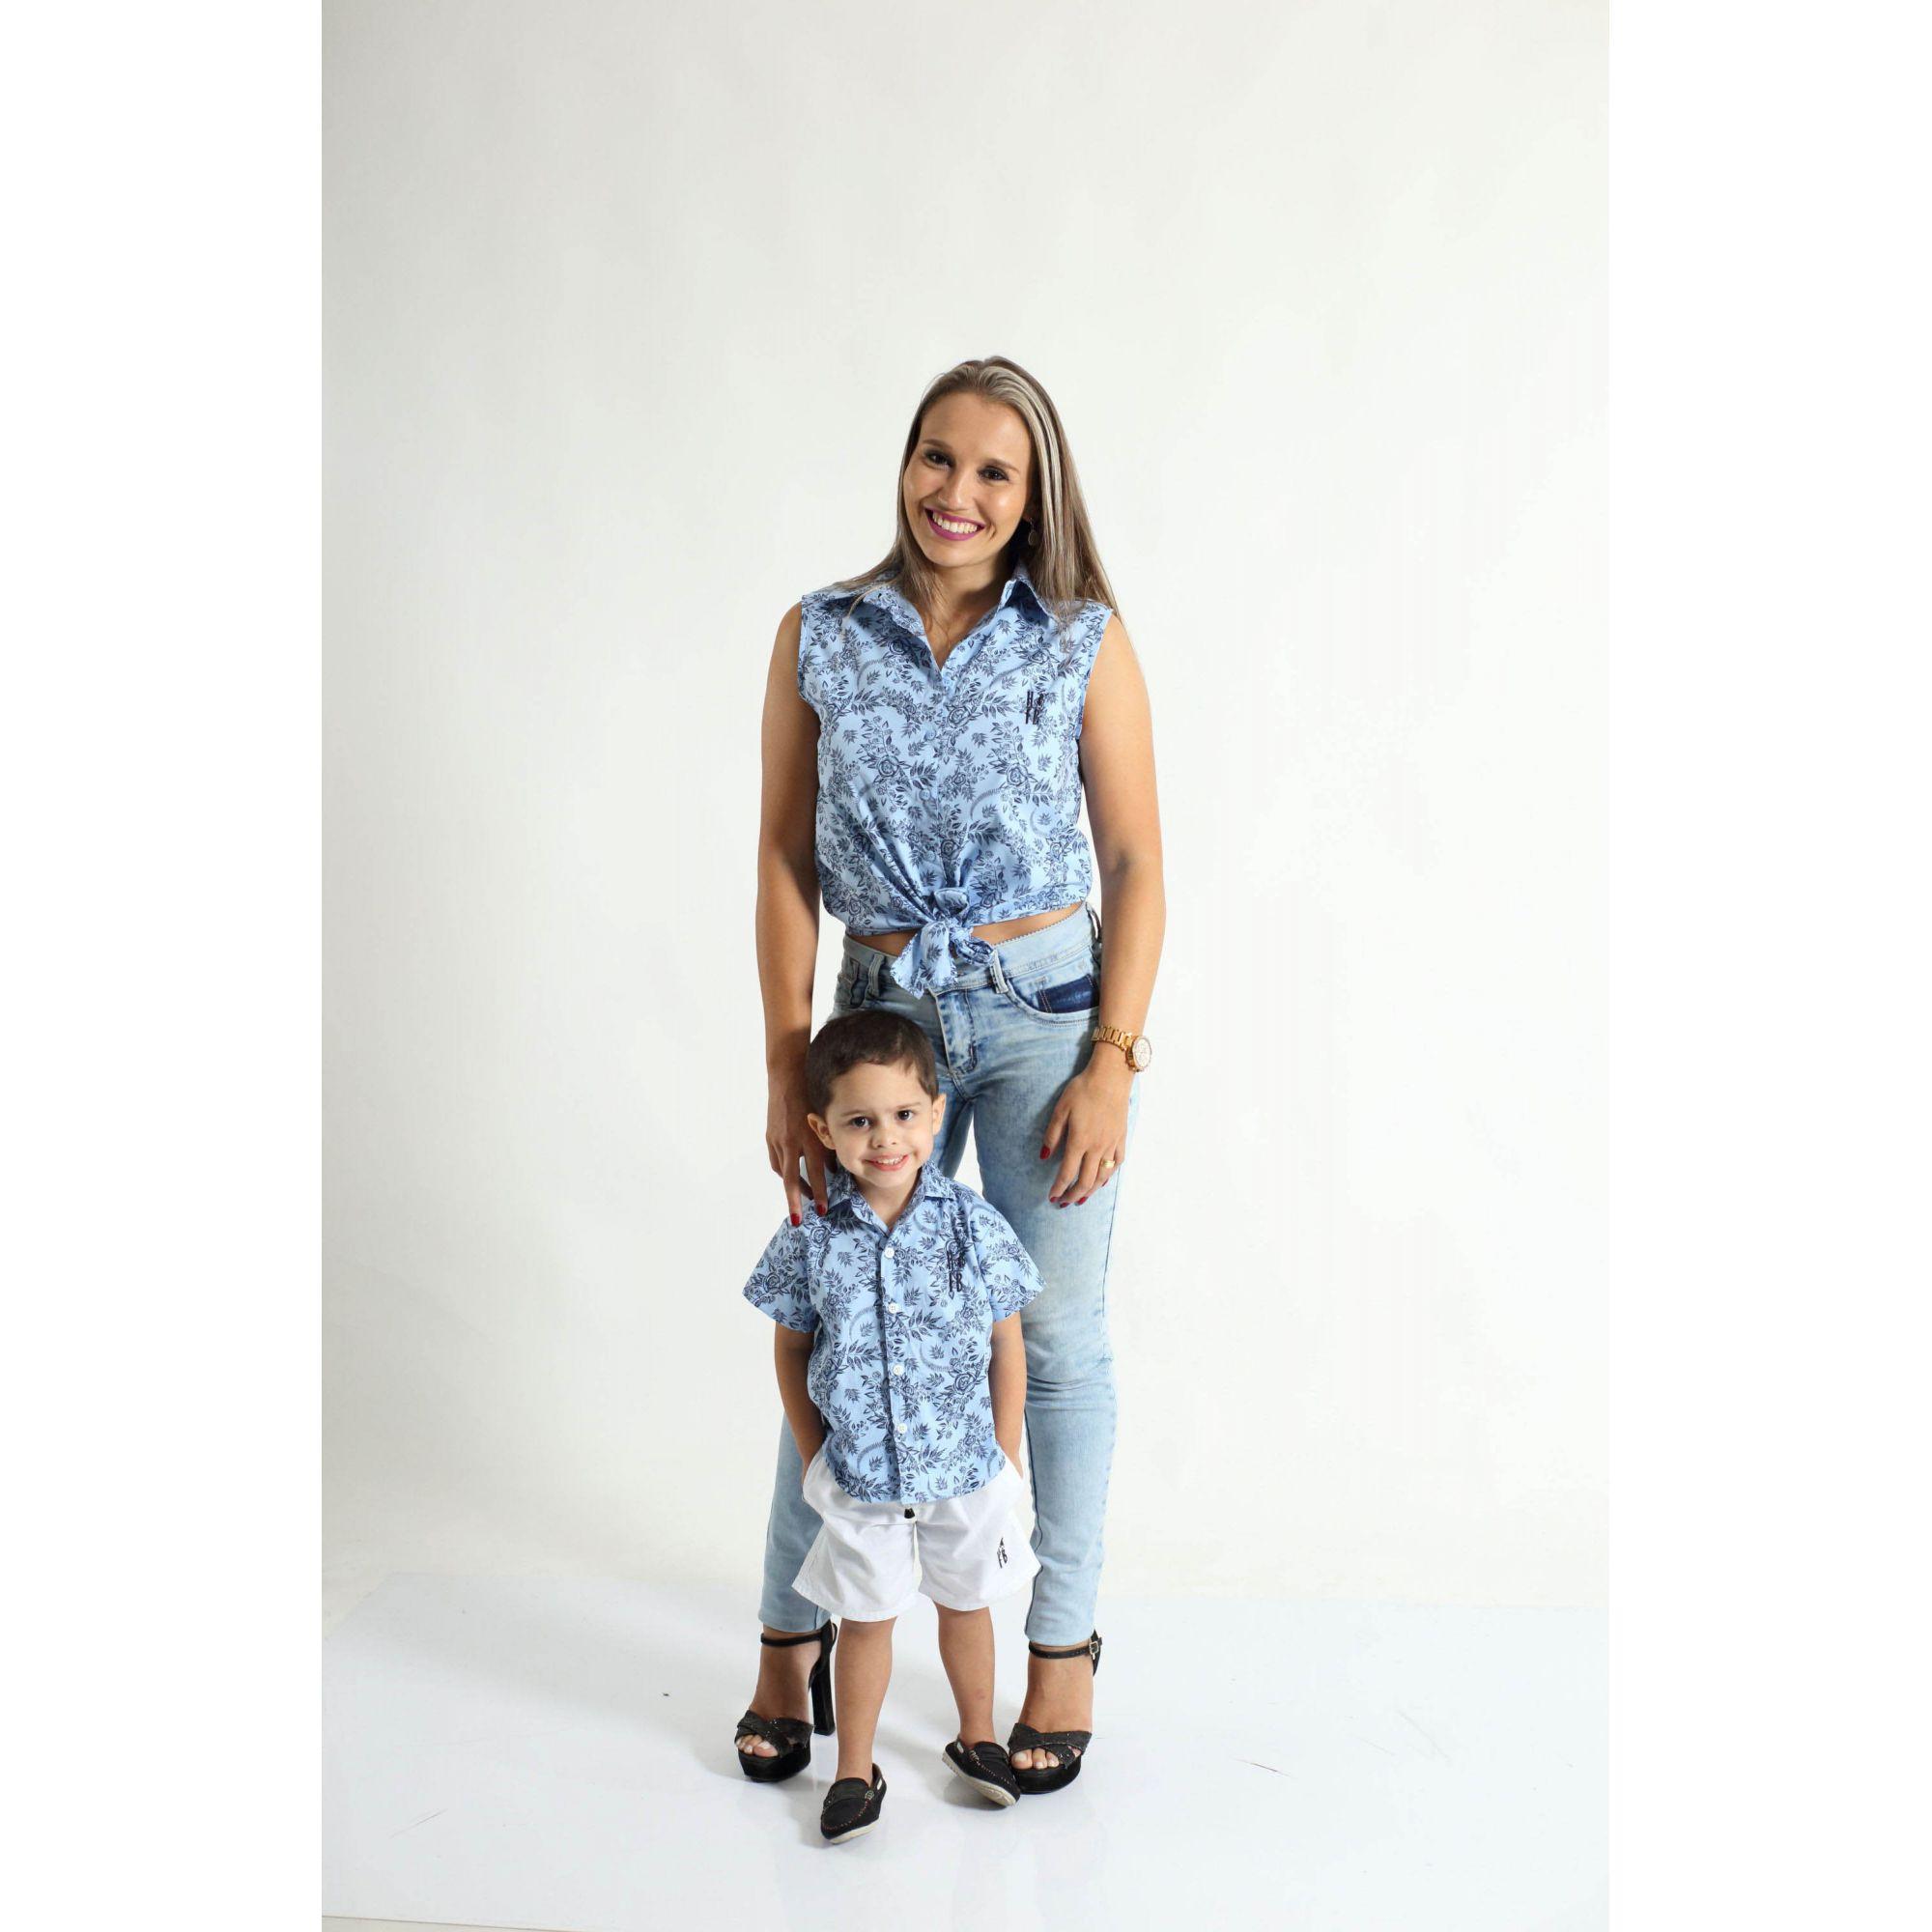 MÃE E FILHO > Kit 02 Camisas Social Adulto e Infantil Azul Floral [Coleção Tal Mãe Tal Filho]